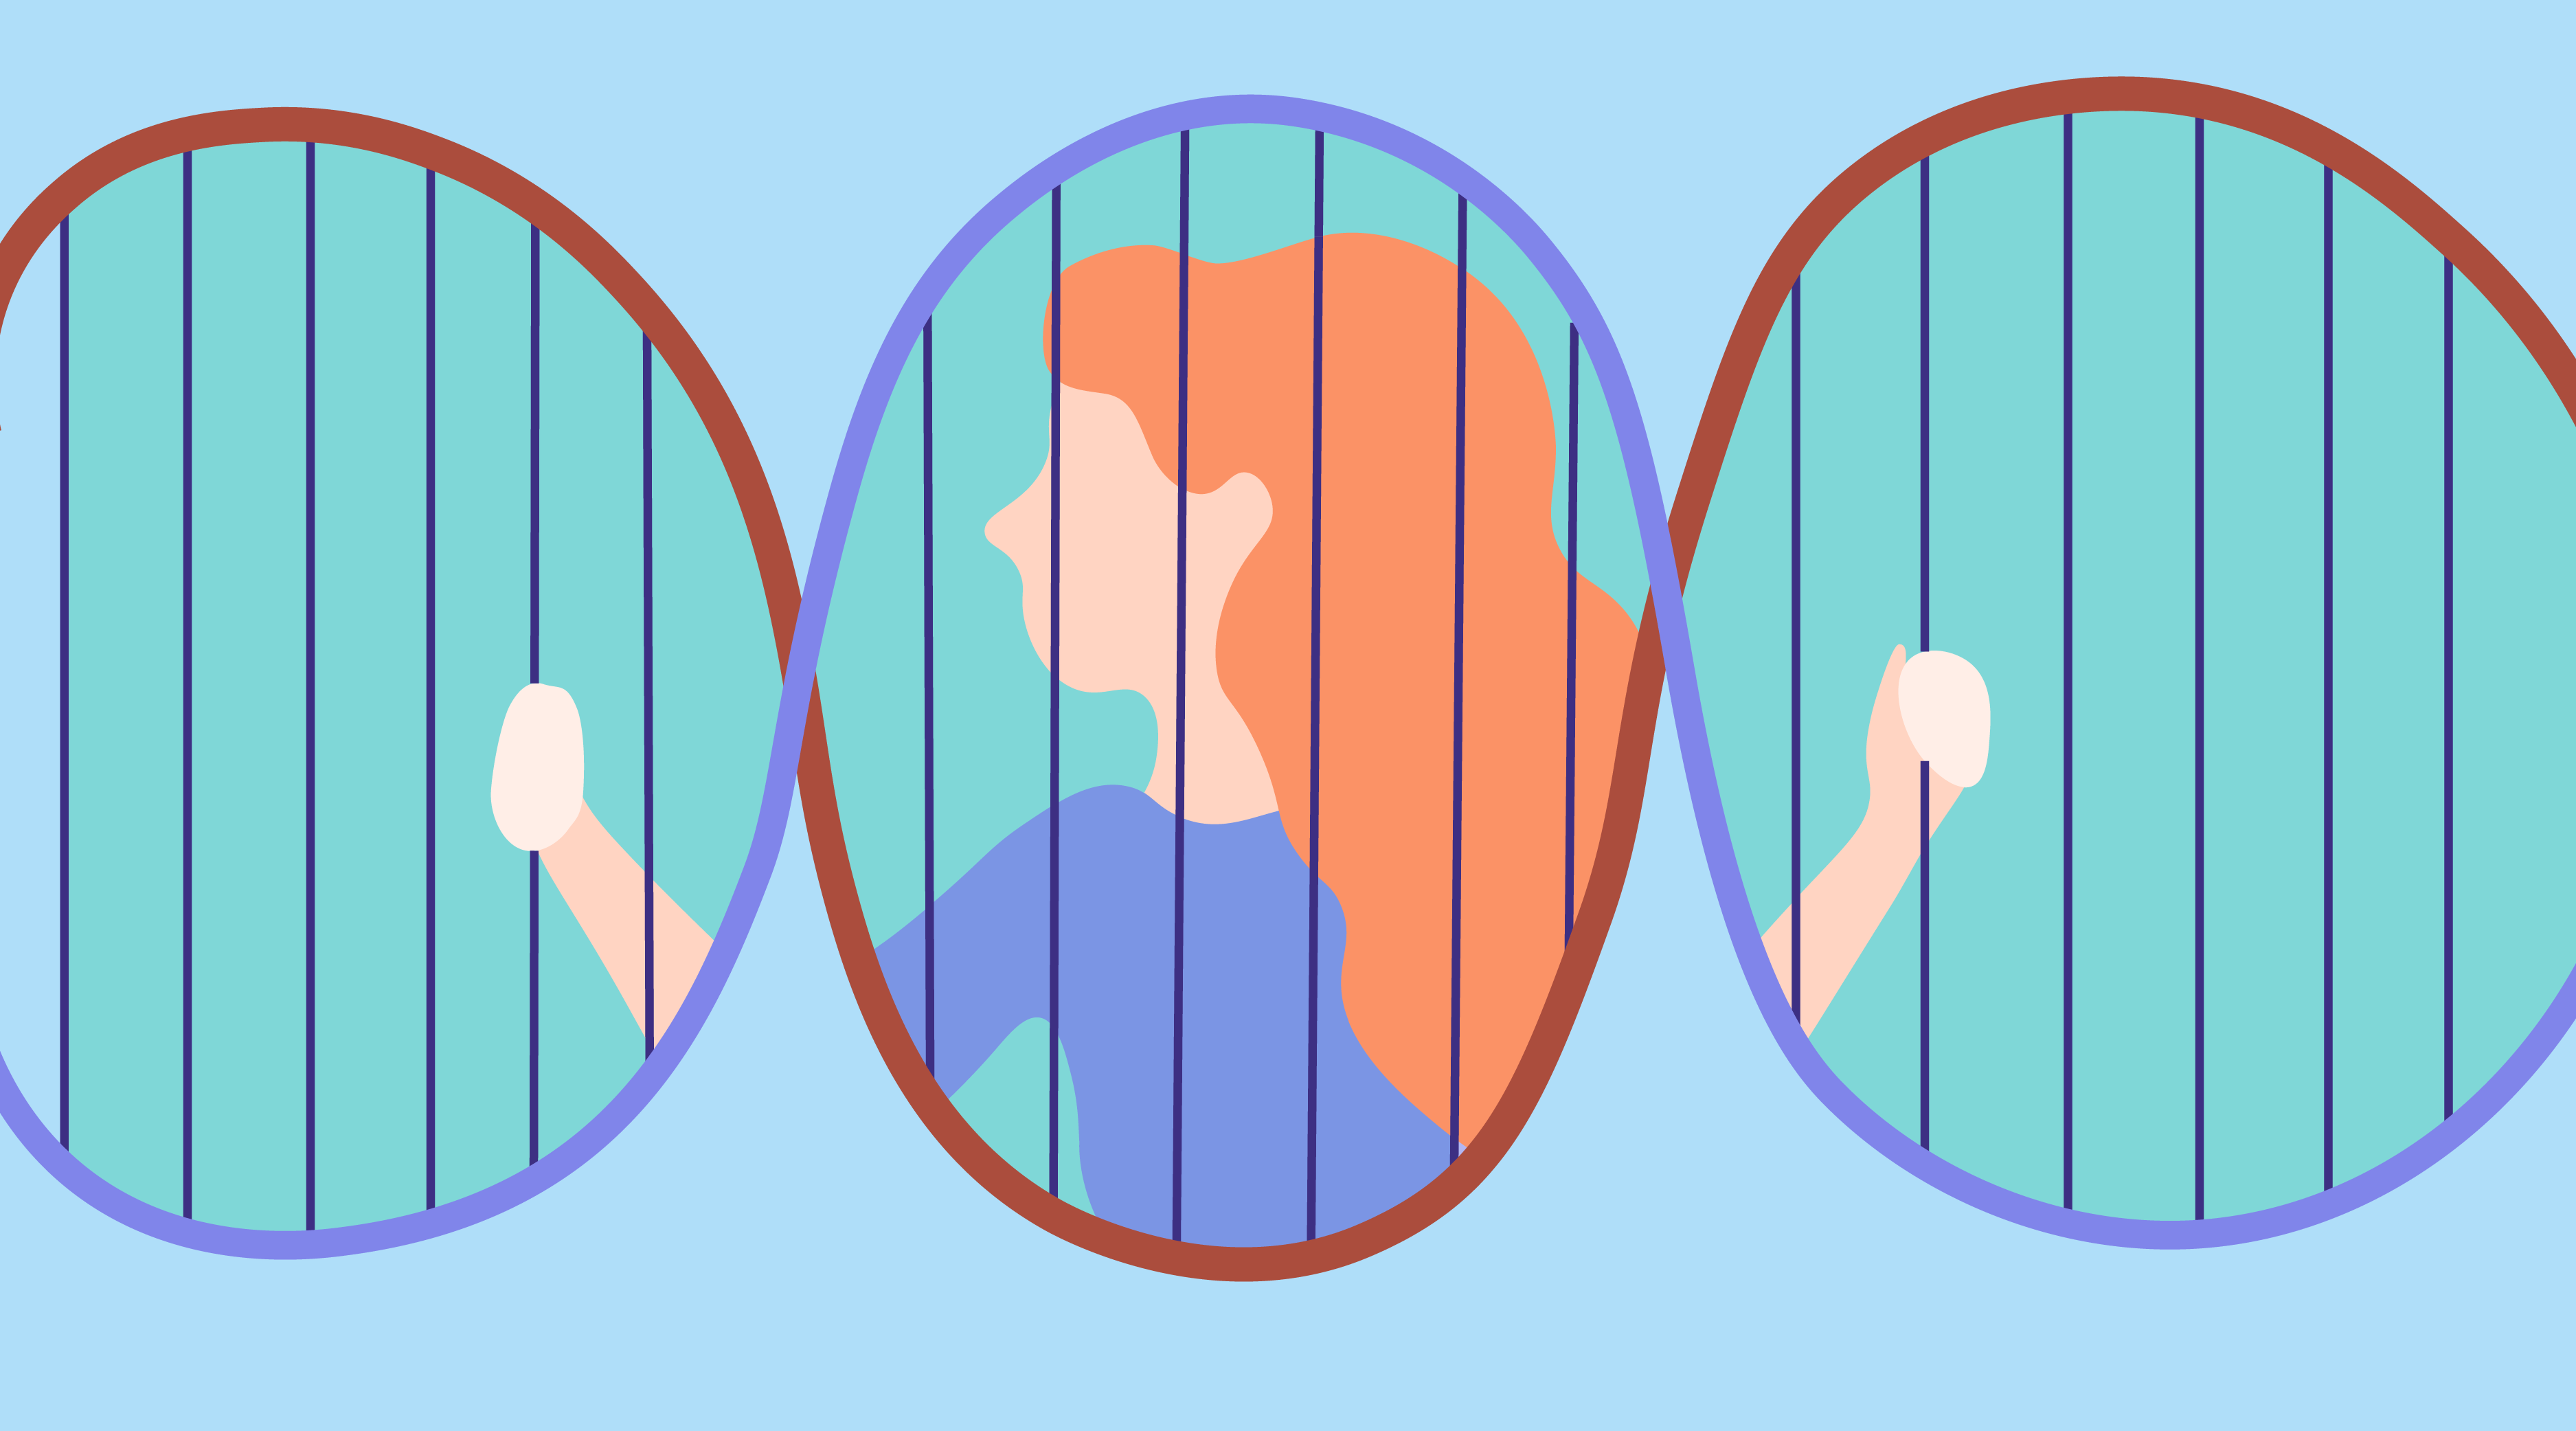 geneticheskij analiz na trombofiliju 2 vivavita